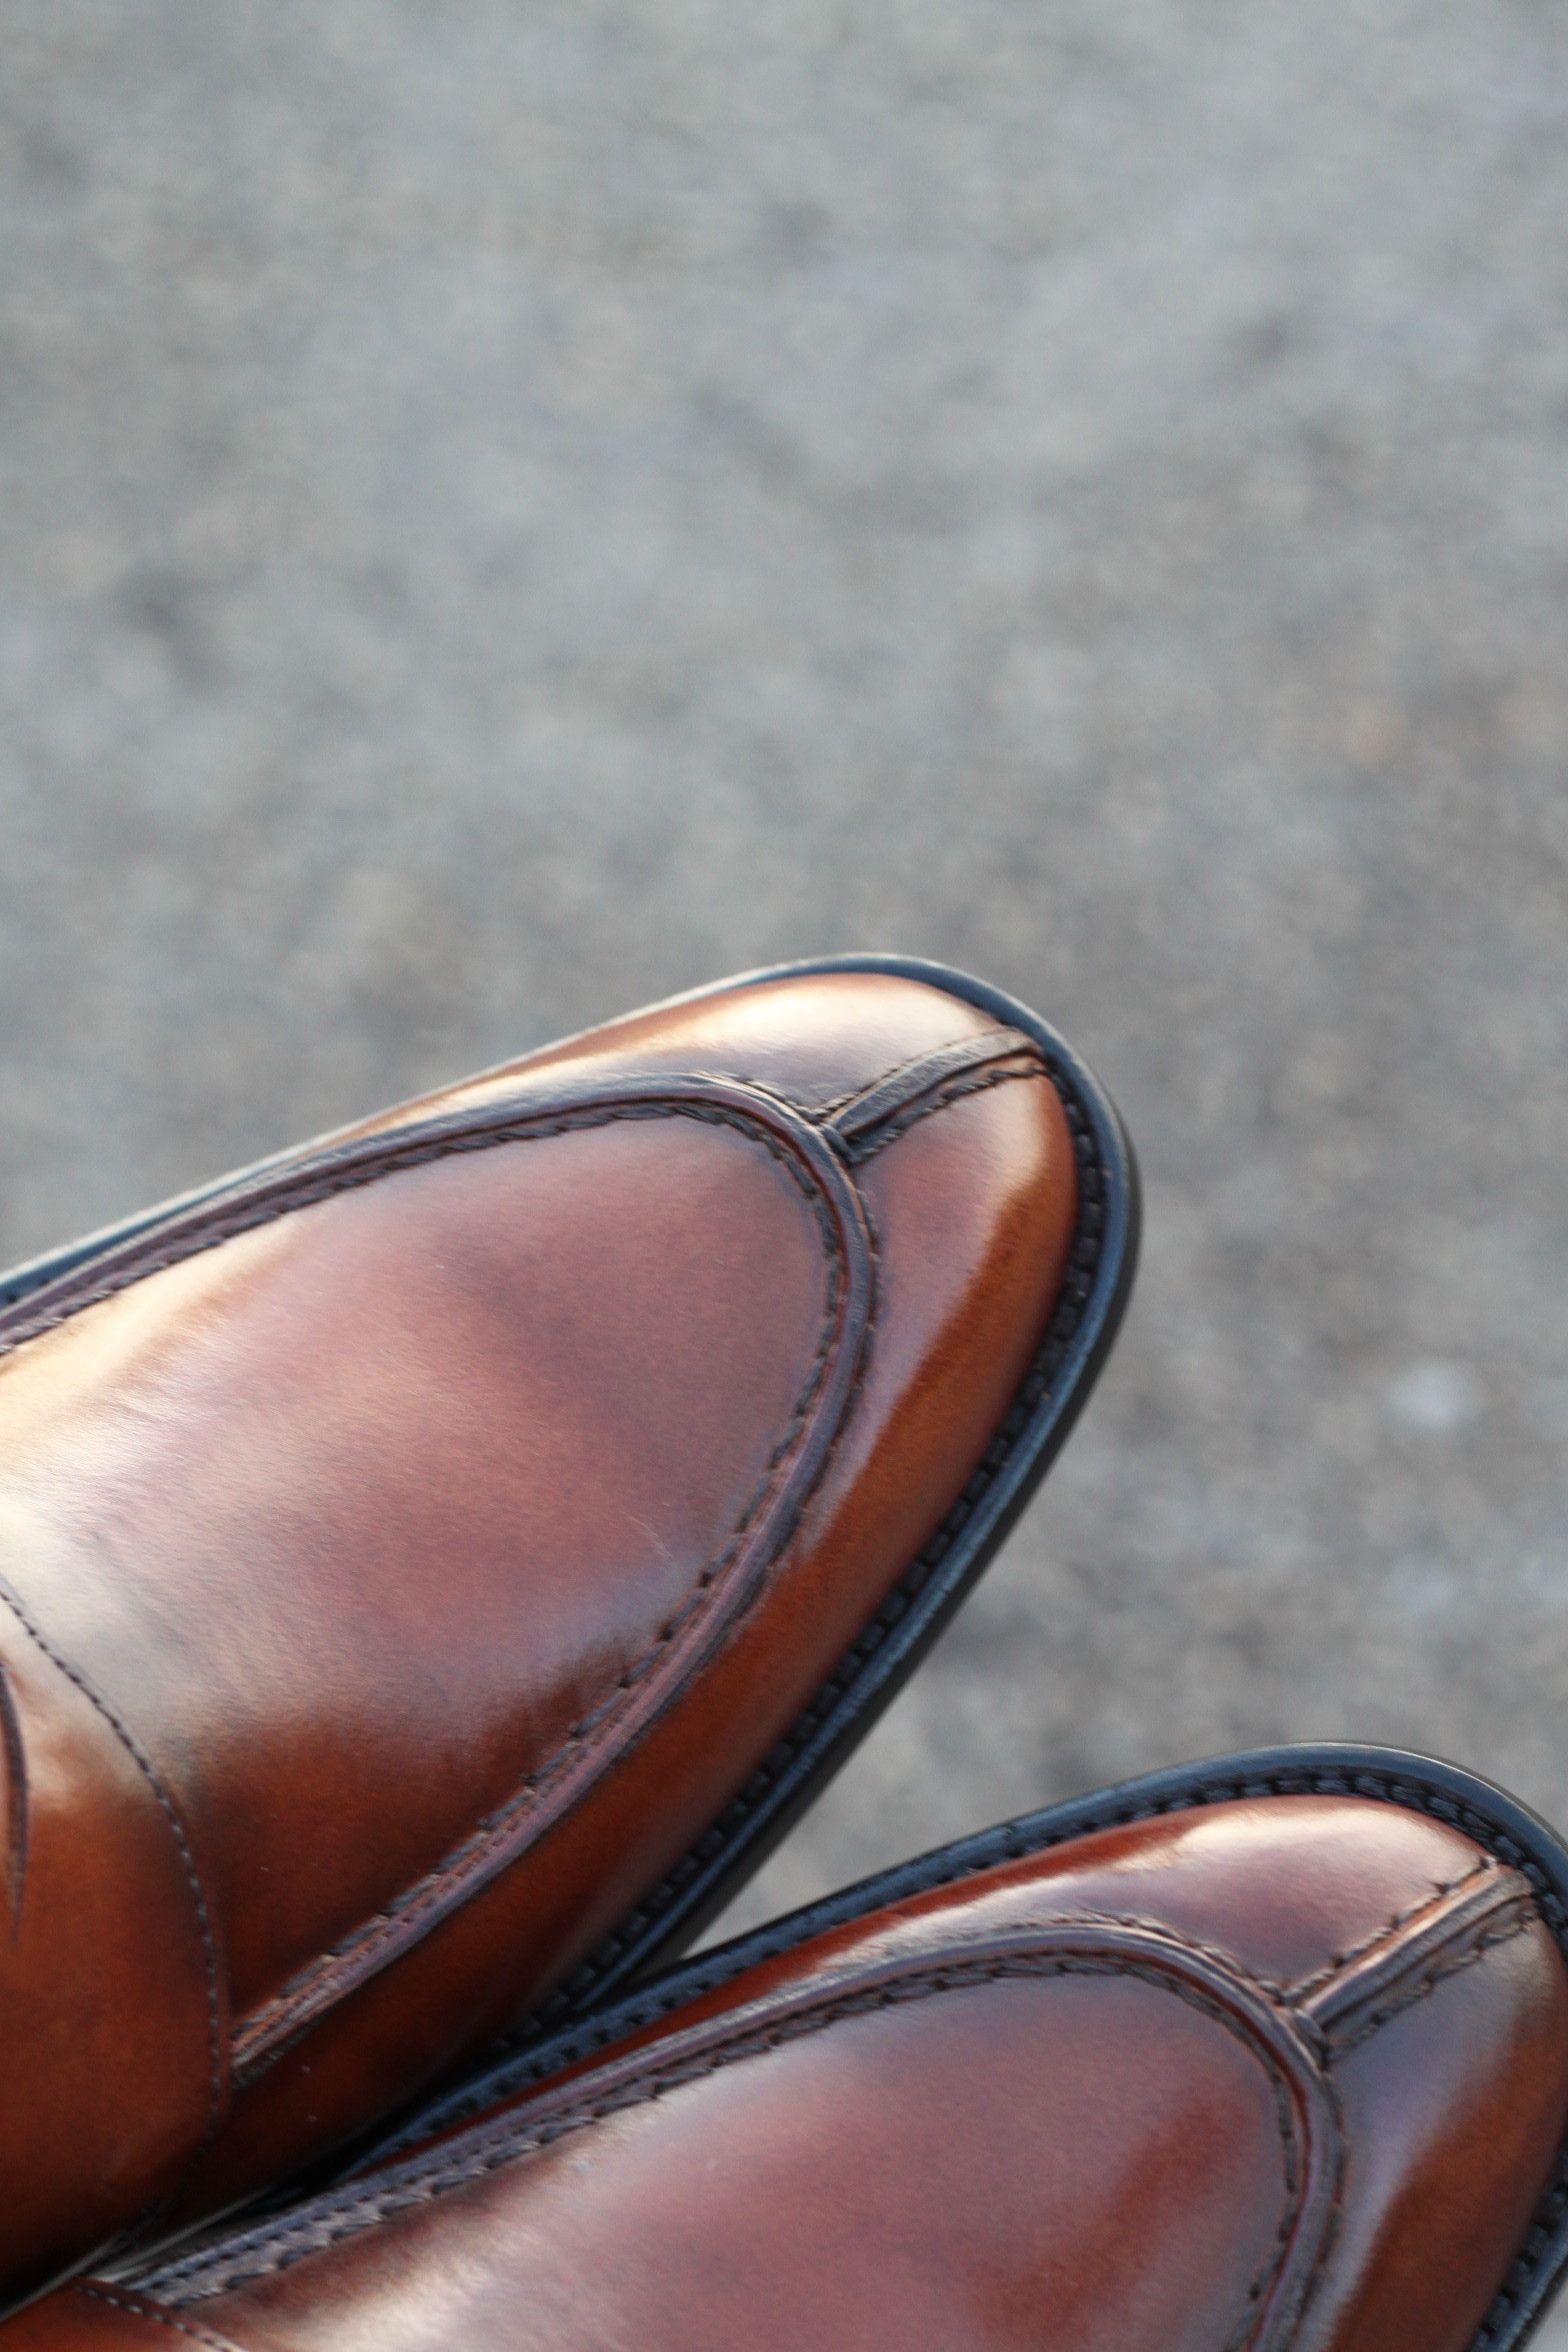 ffea26a4e Sapato Social Masculino Loafer CNS em couro cor Damasco